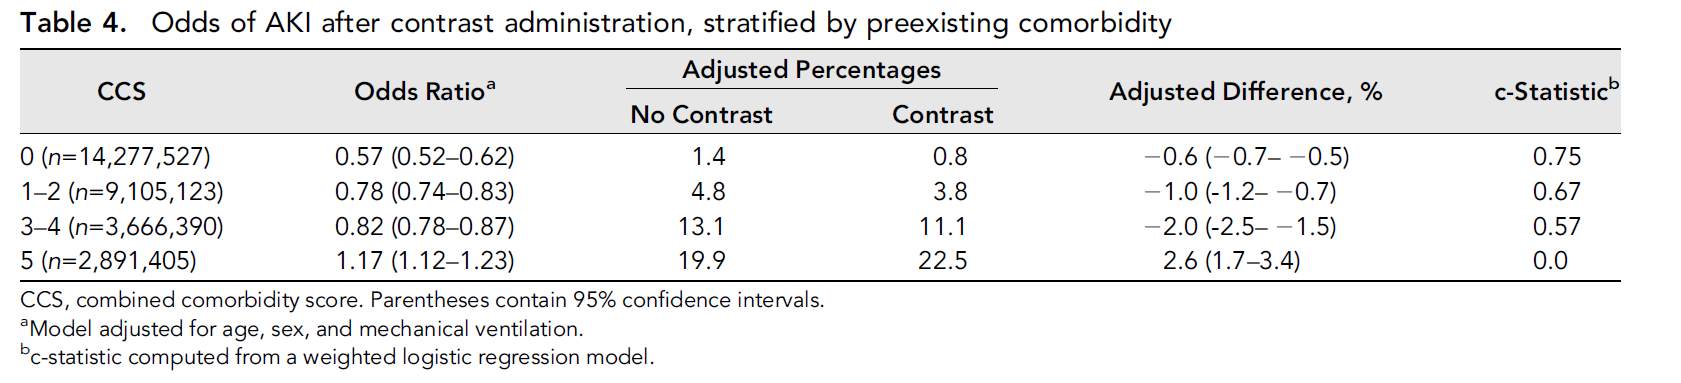 Table 4: from Wilhelm-Leen et al, JASN 2016